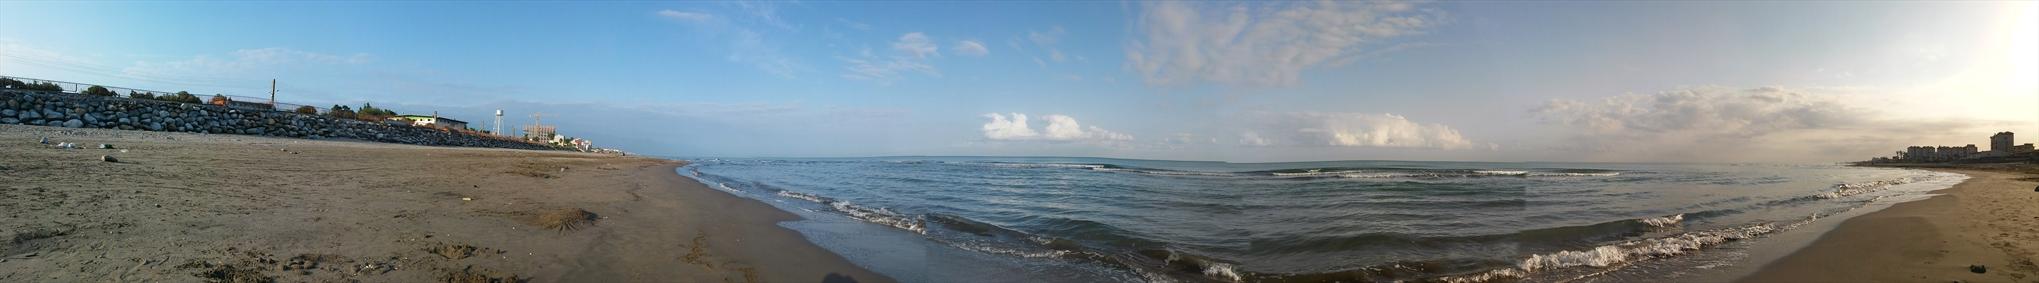 پانورامای ساحل